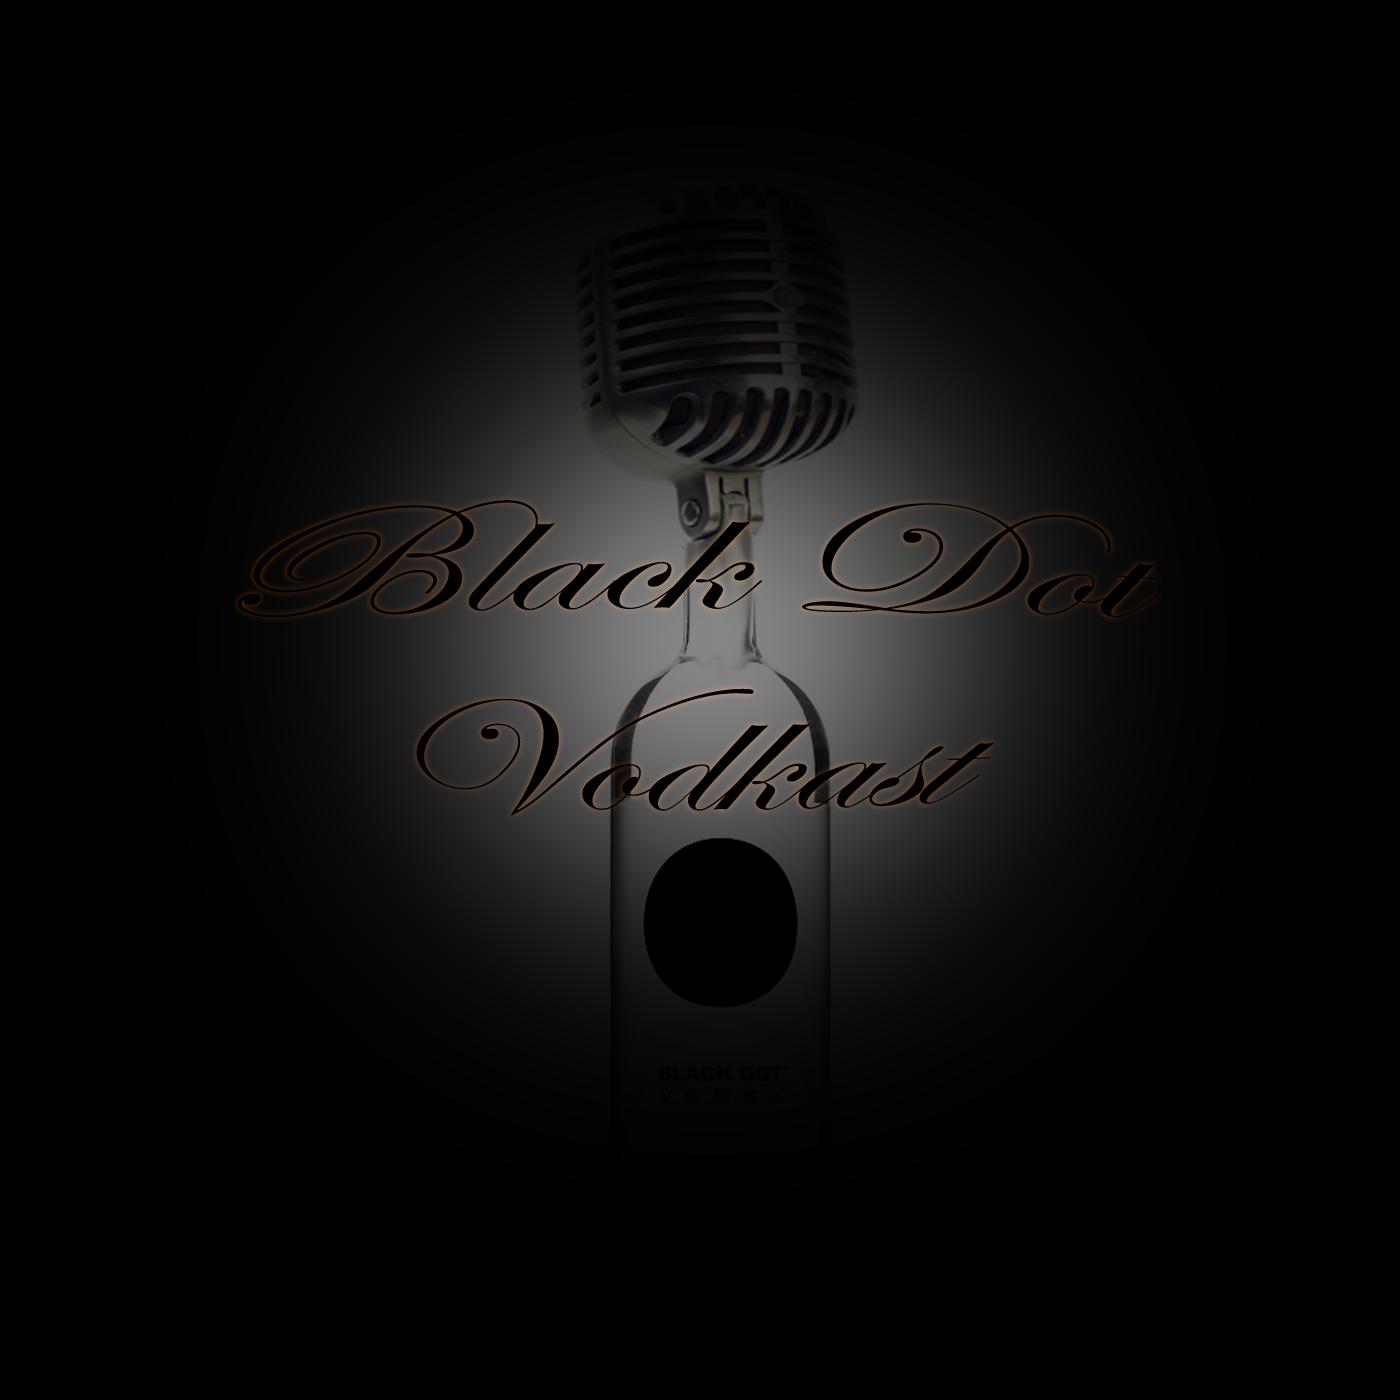 Black Dot Vodkast - Letter R Productions